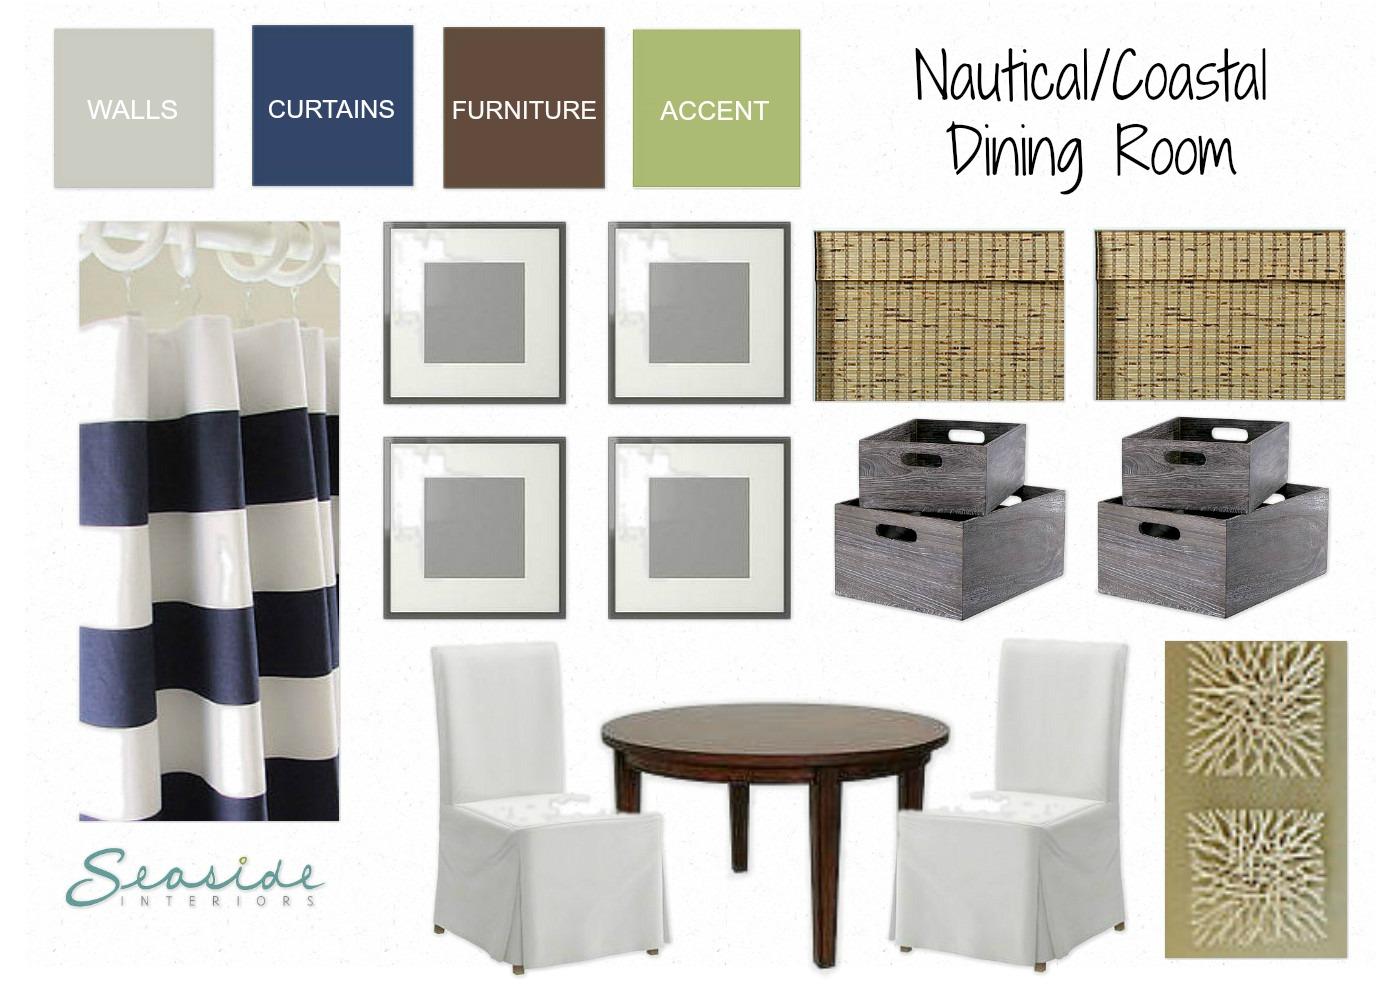 Nautical Coastal Dining Room Design. Seaside Interiors  Nautical Coastal Dining Room Design